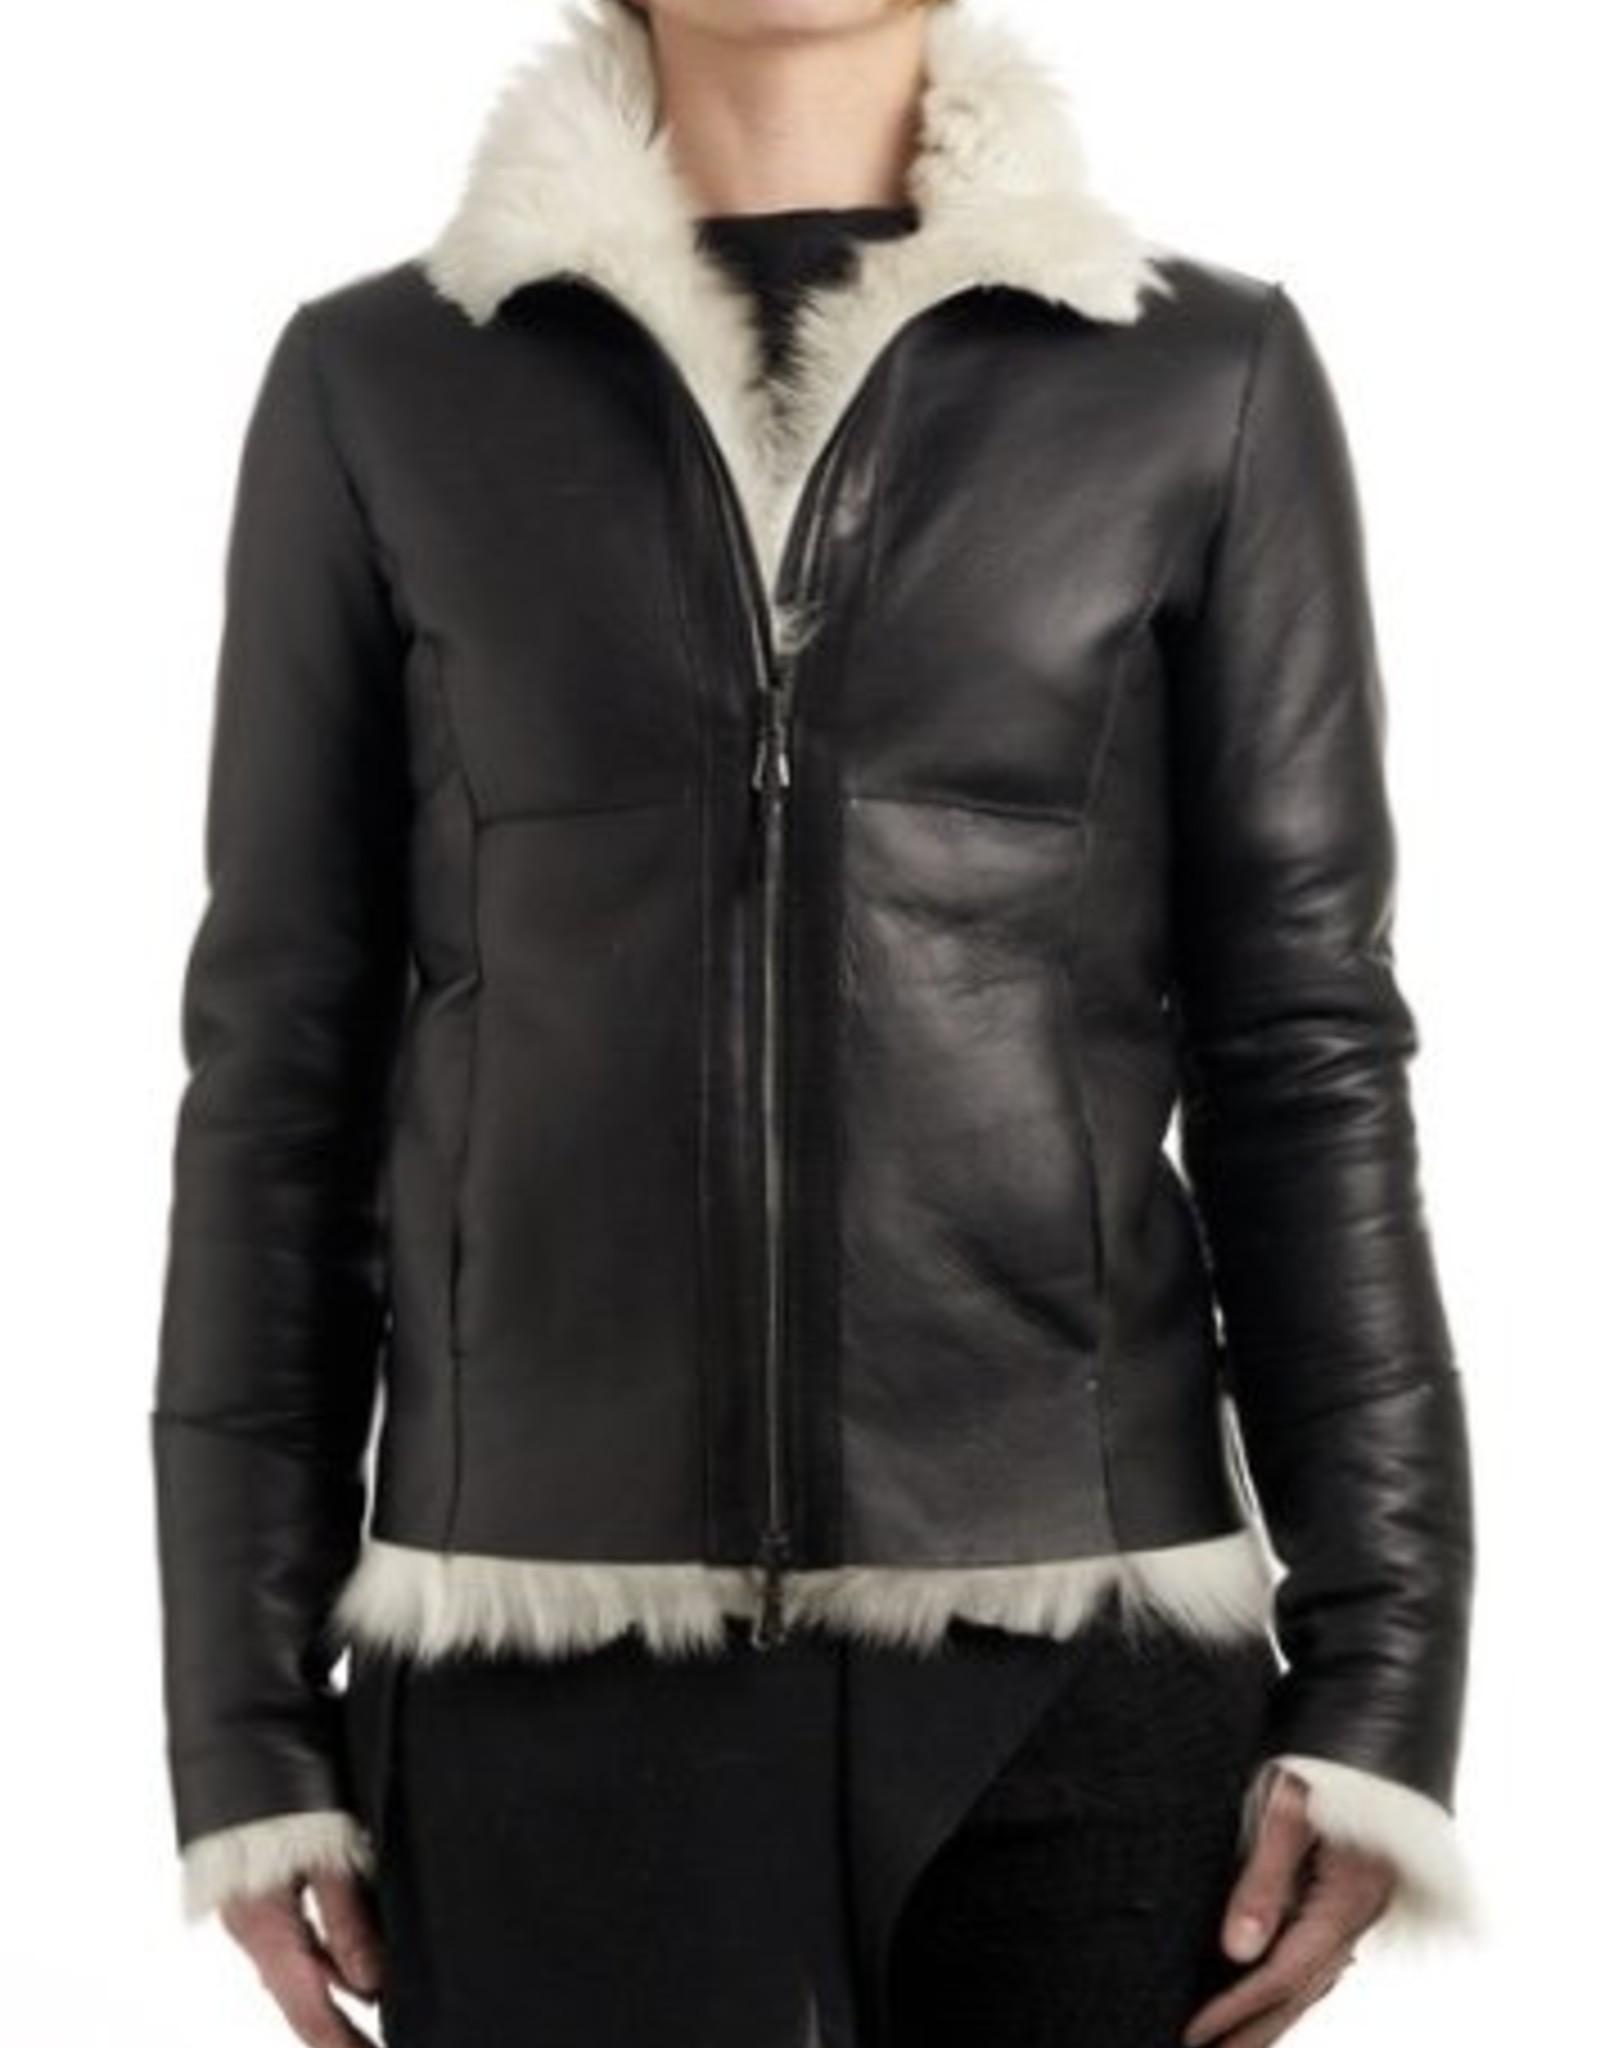 Eros CV - black and white shearling jacket